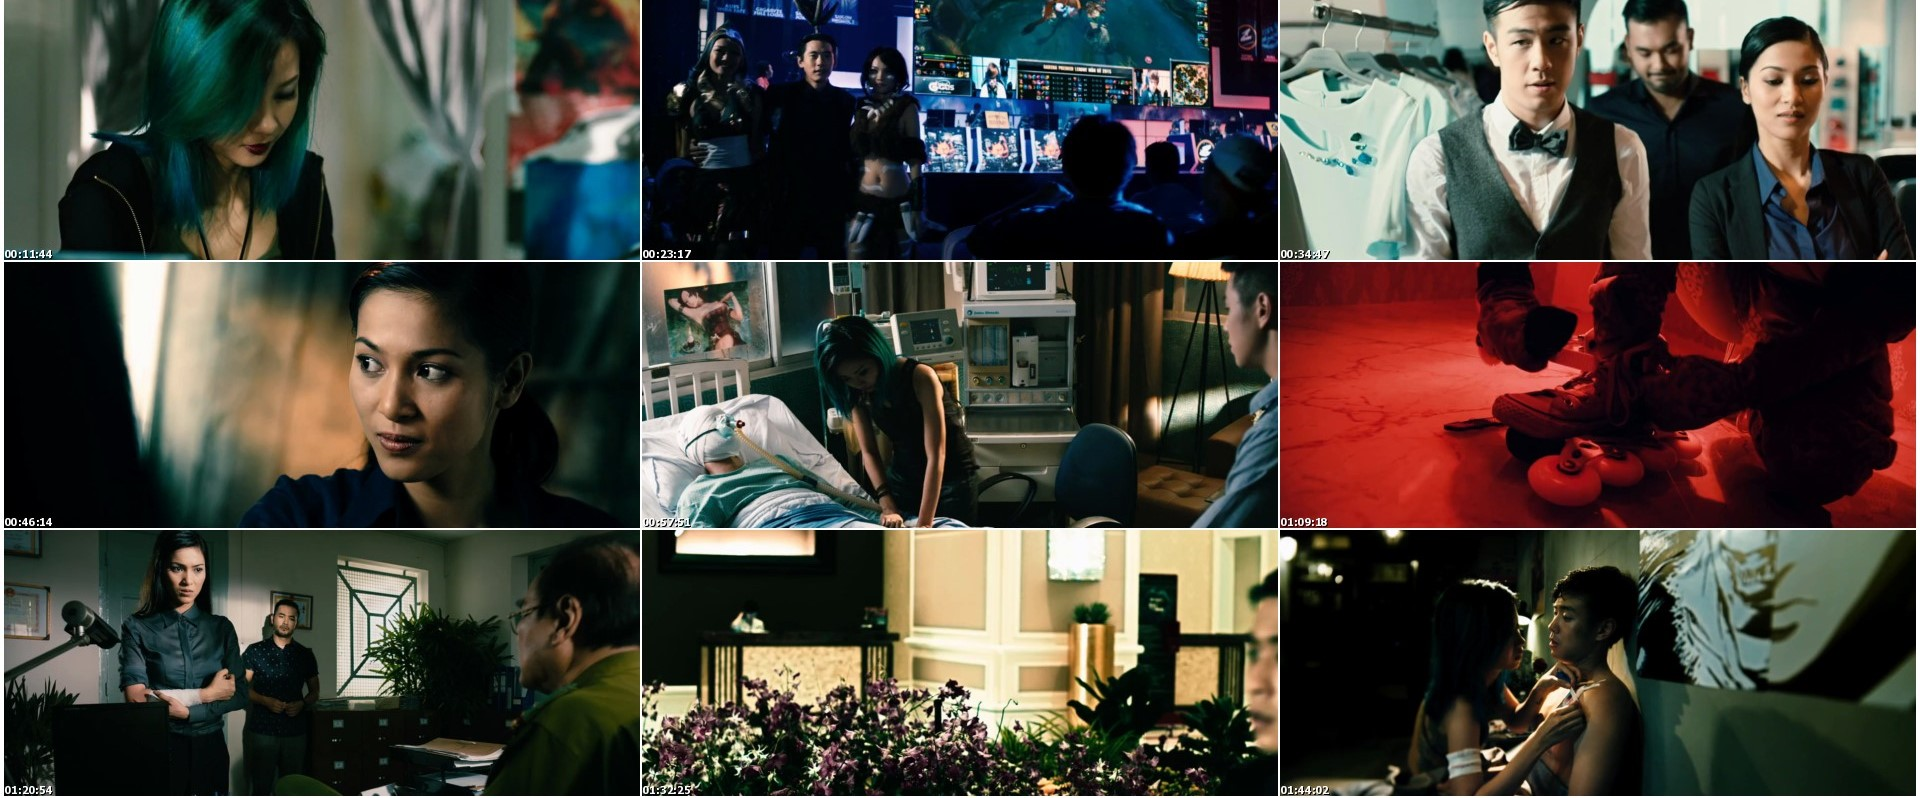 Bitcoin-Heist-2016-Blu-Ray-720p-Mkv-Cage-Yek-Movie-s